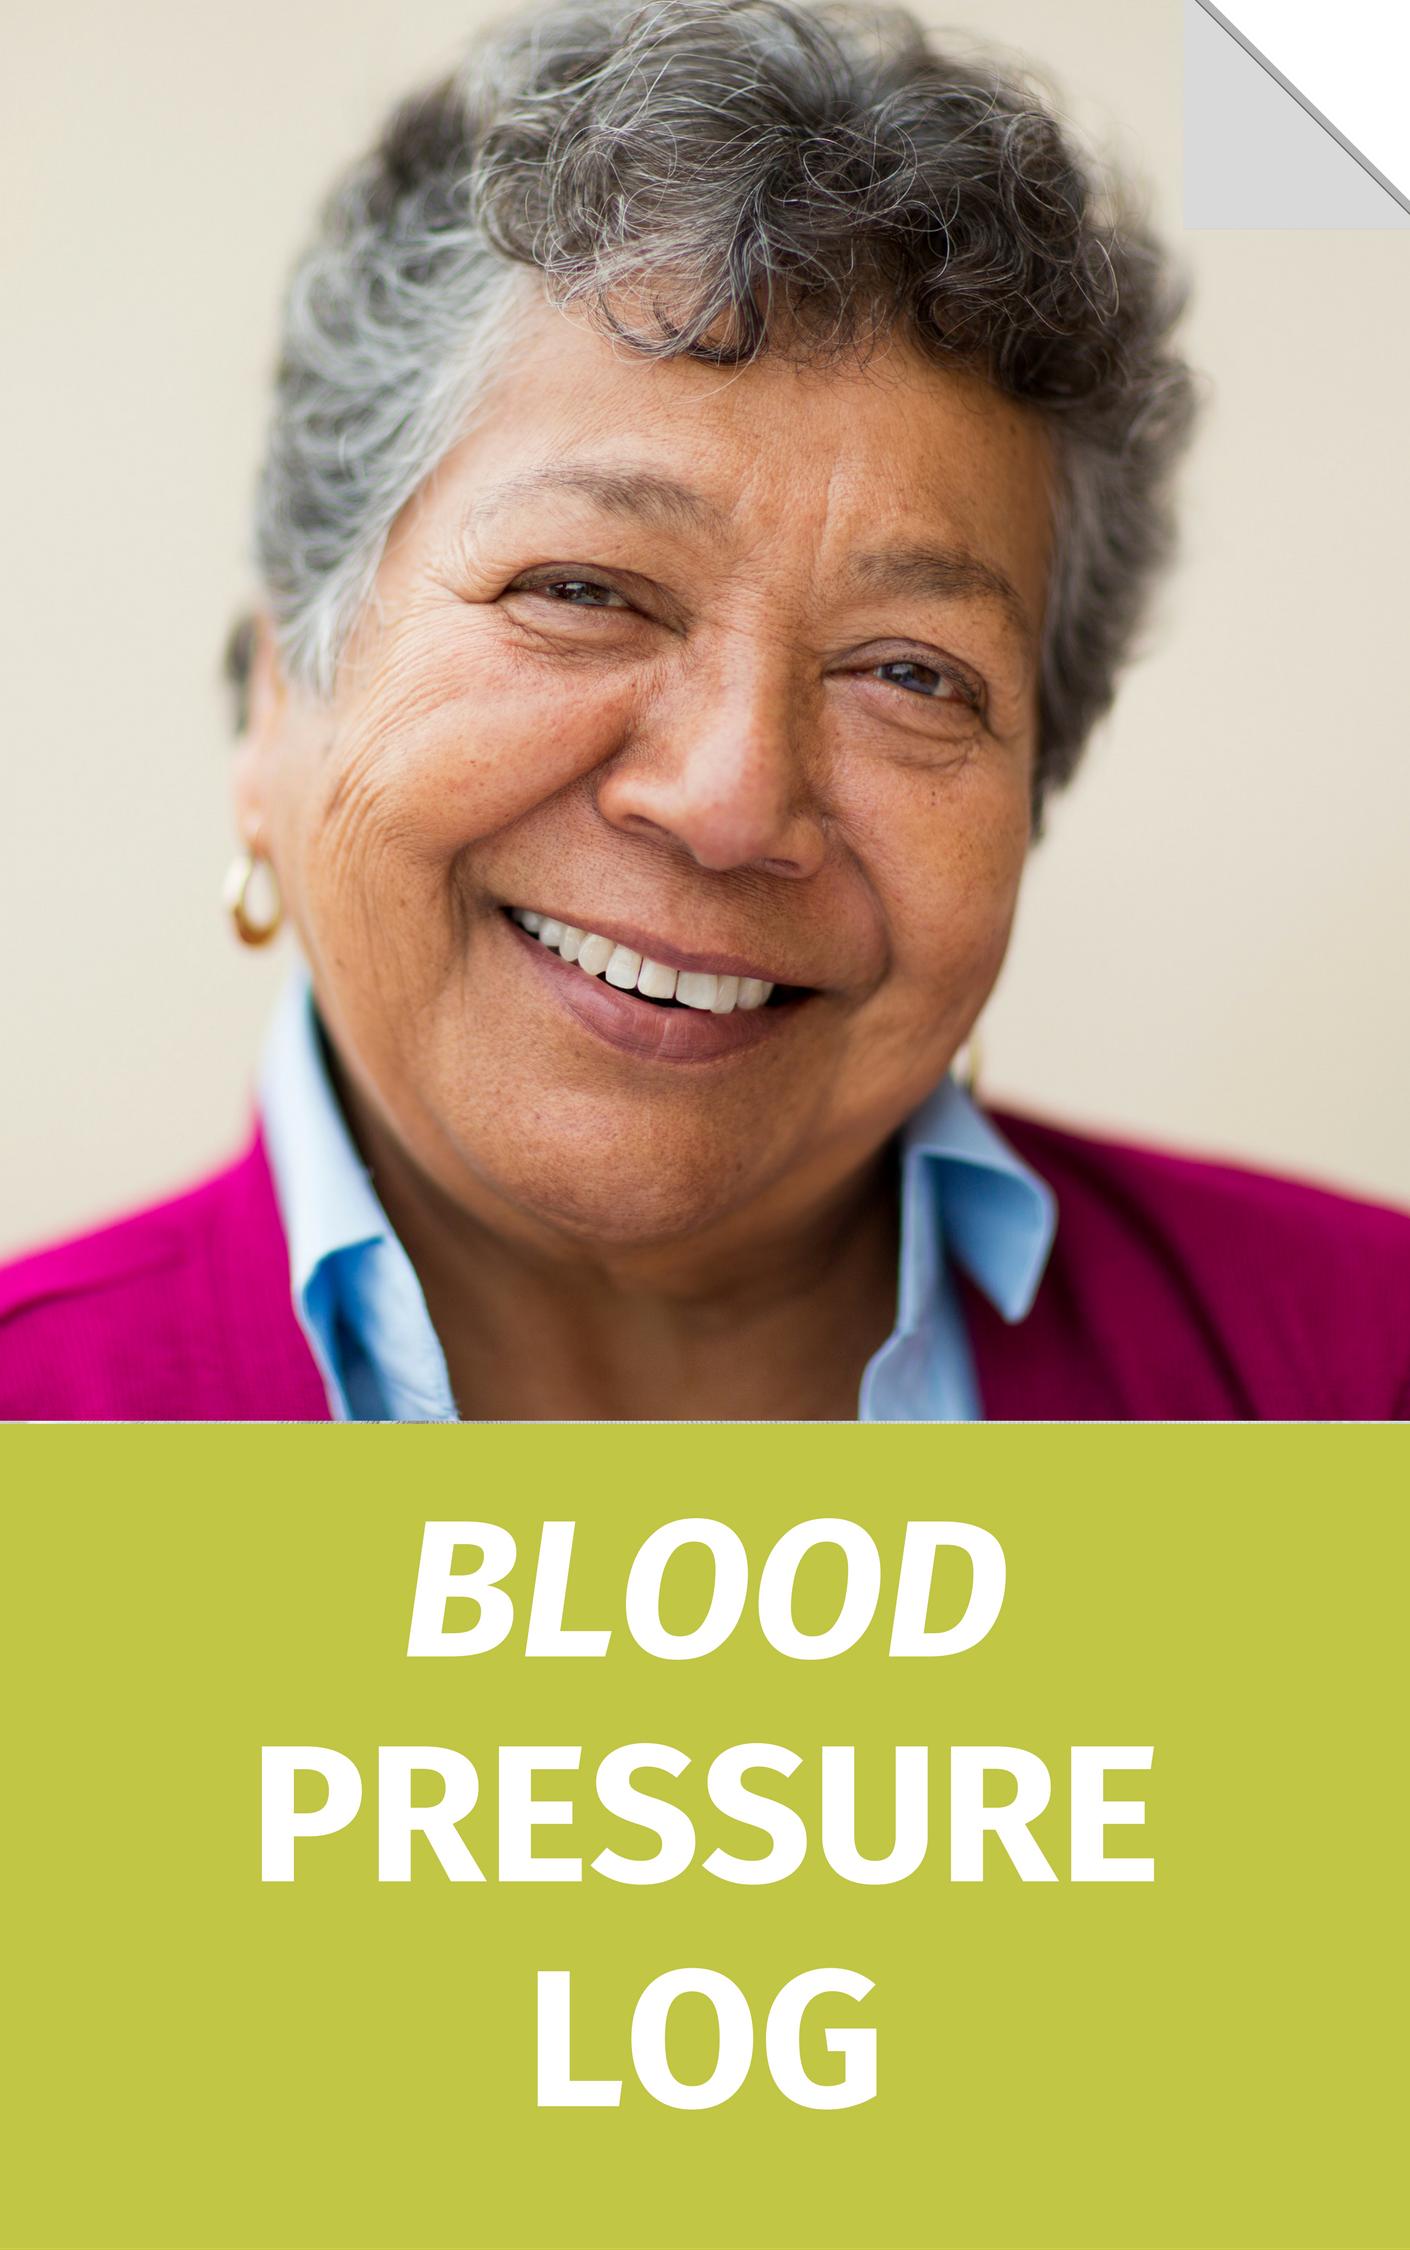 Blood Pressure Log